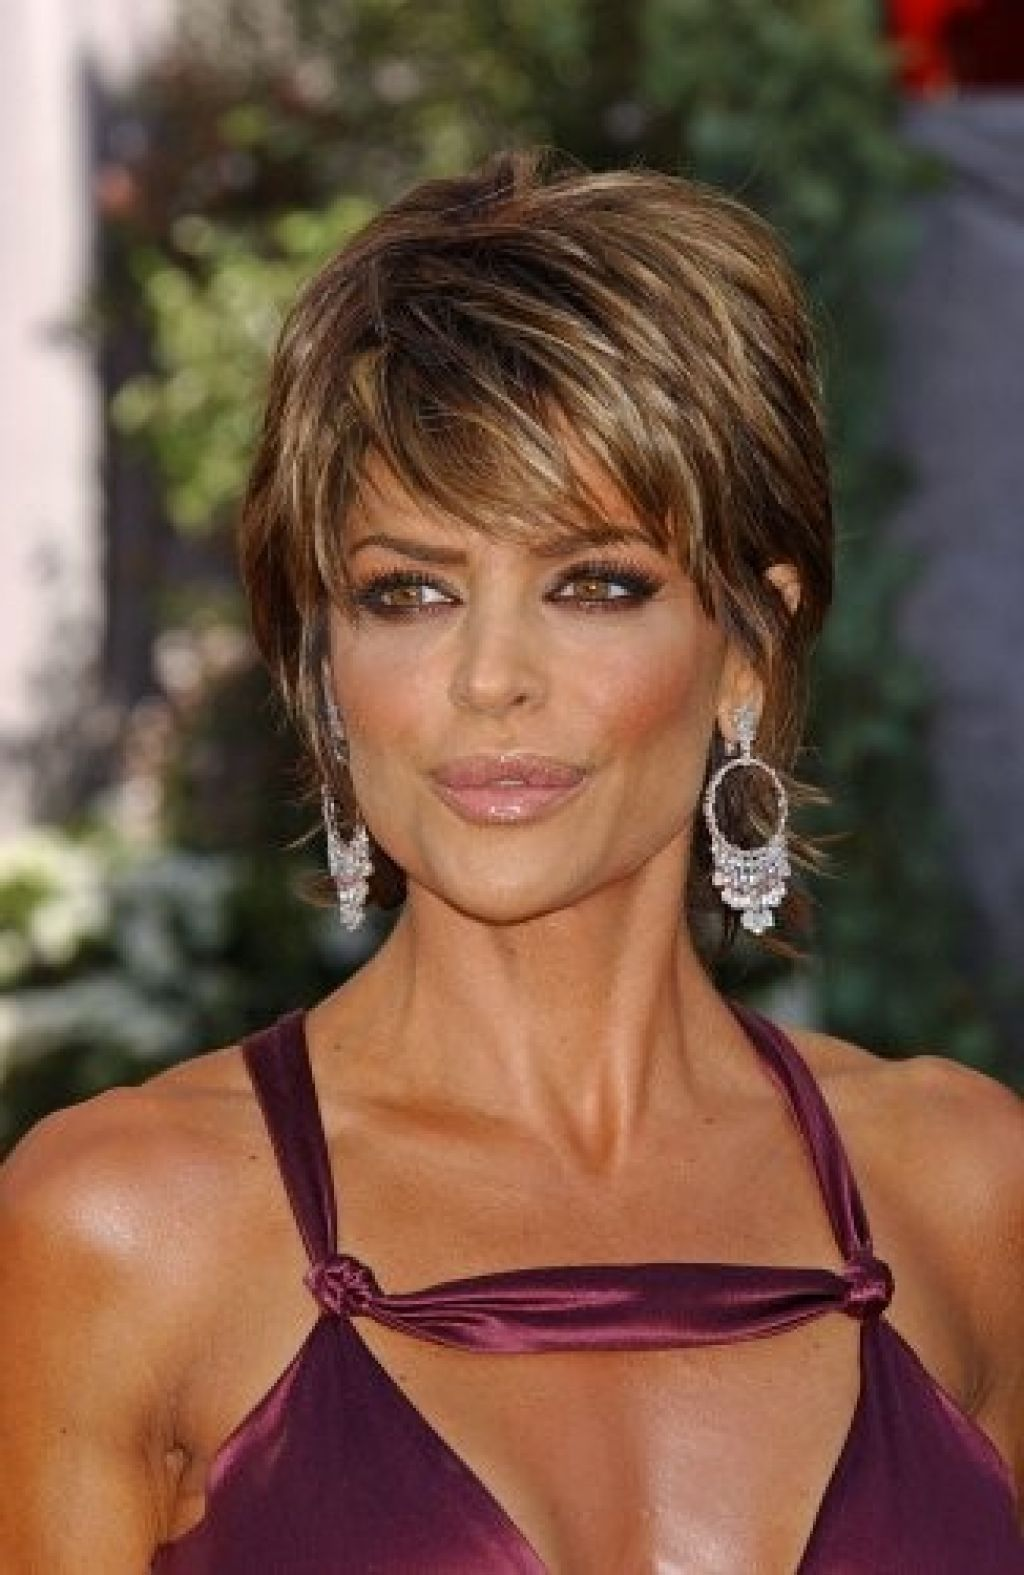 Short Shaggy Hairstyles For Fine Hair - Women Medium Hairstyle ...